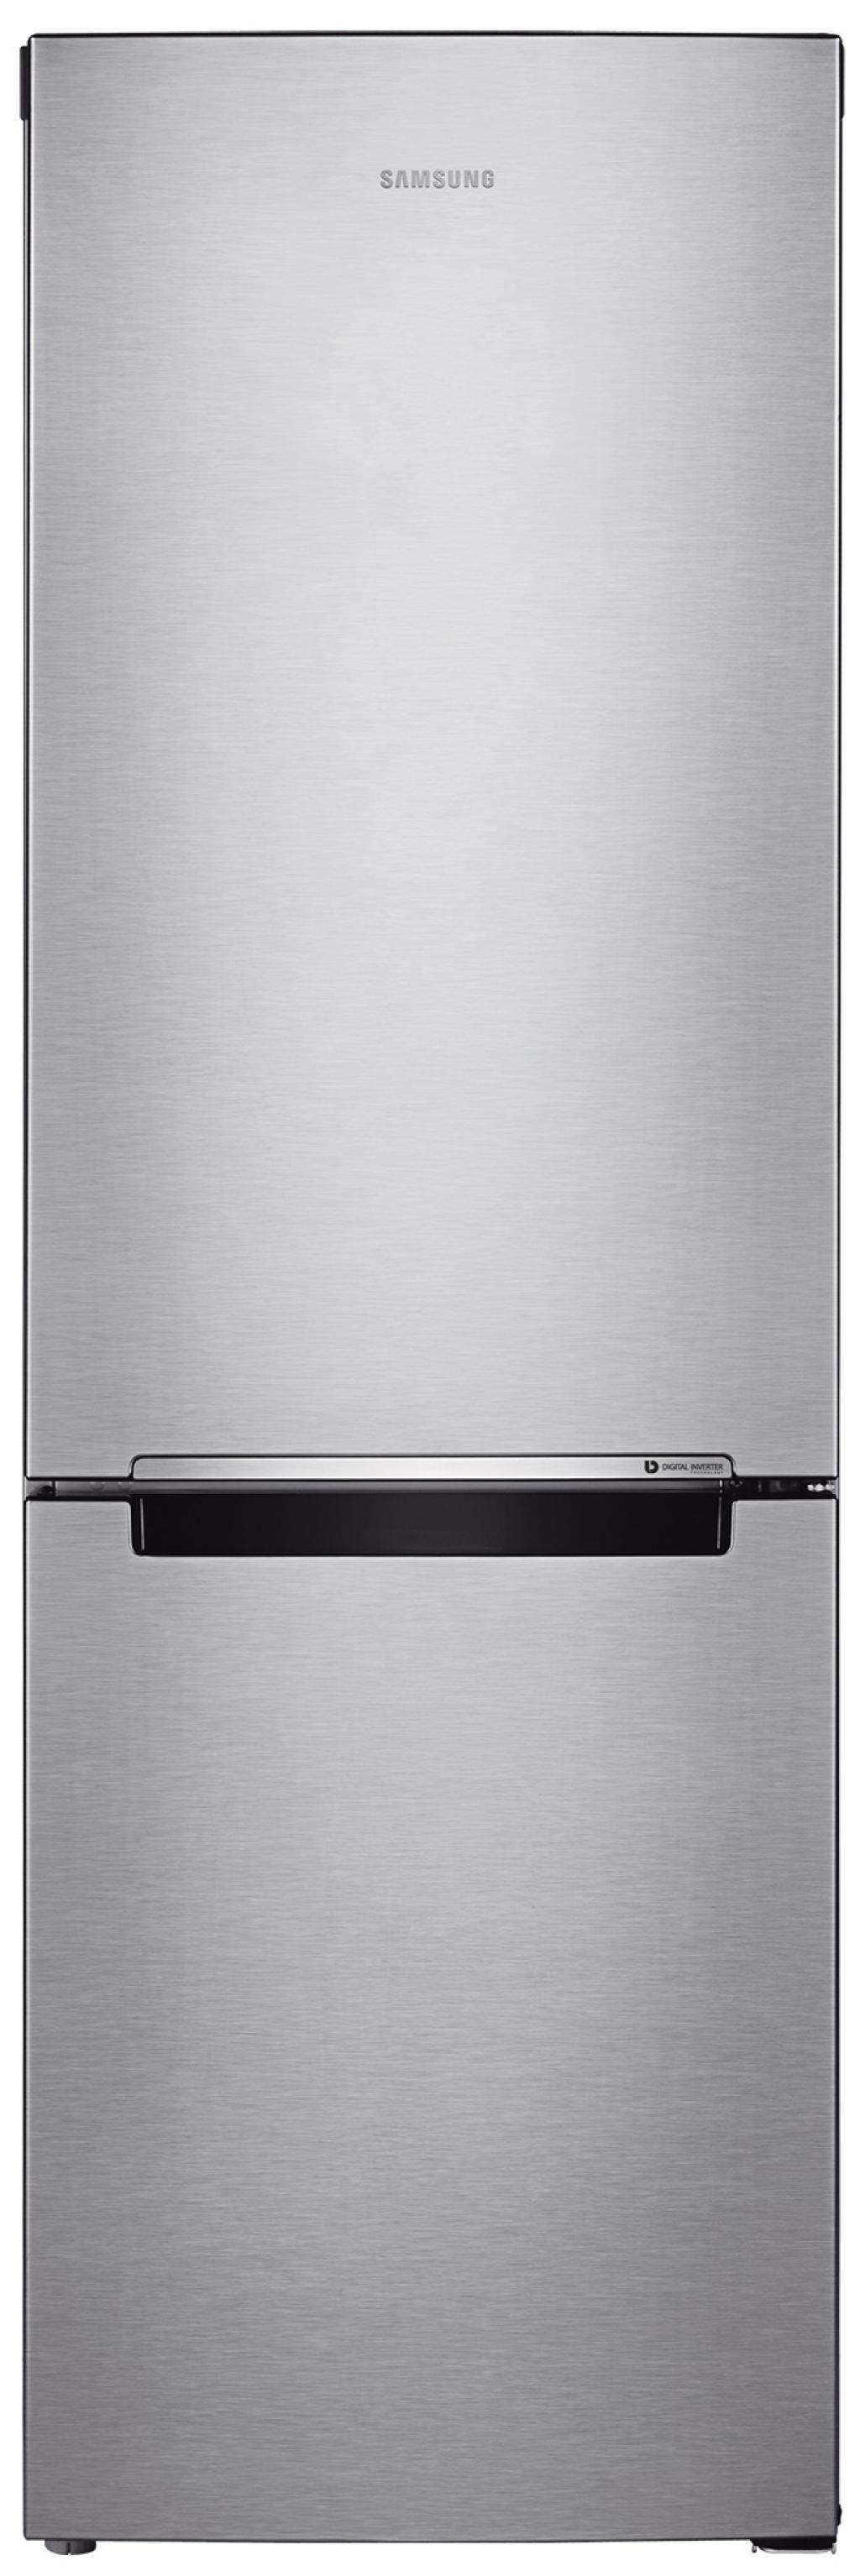 Хладилник с фризер Samsung RB30J3000SA/EO/RLF